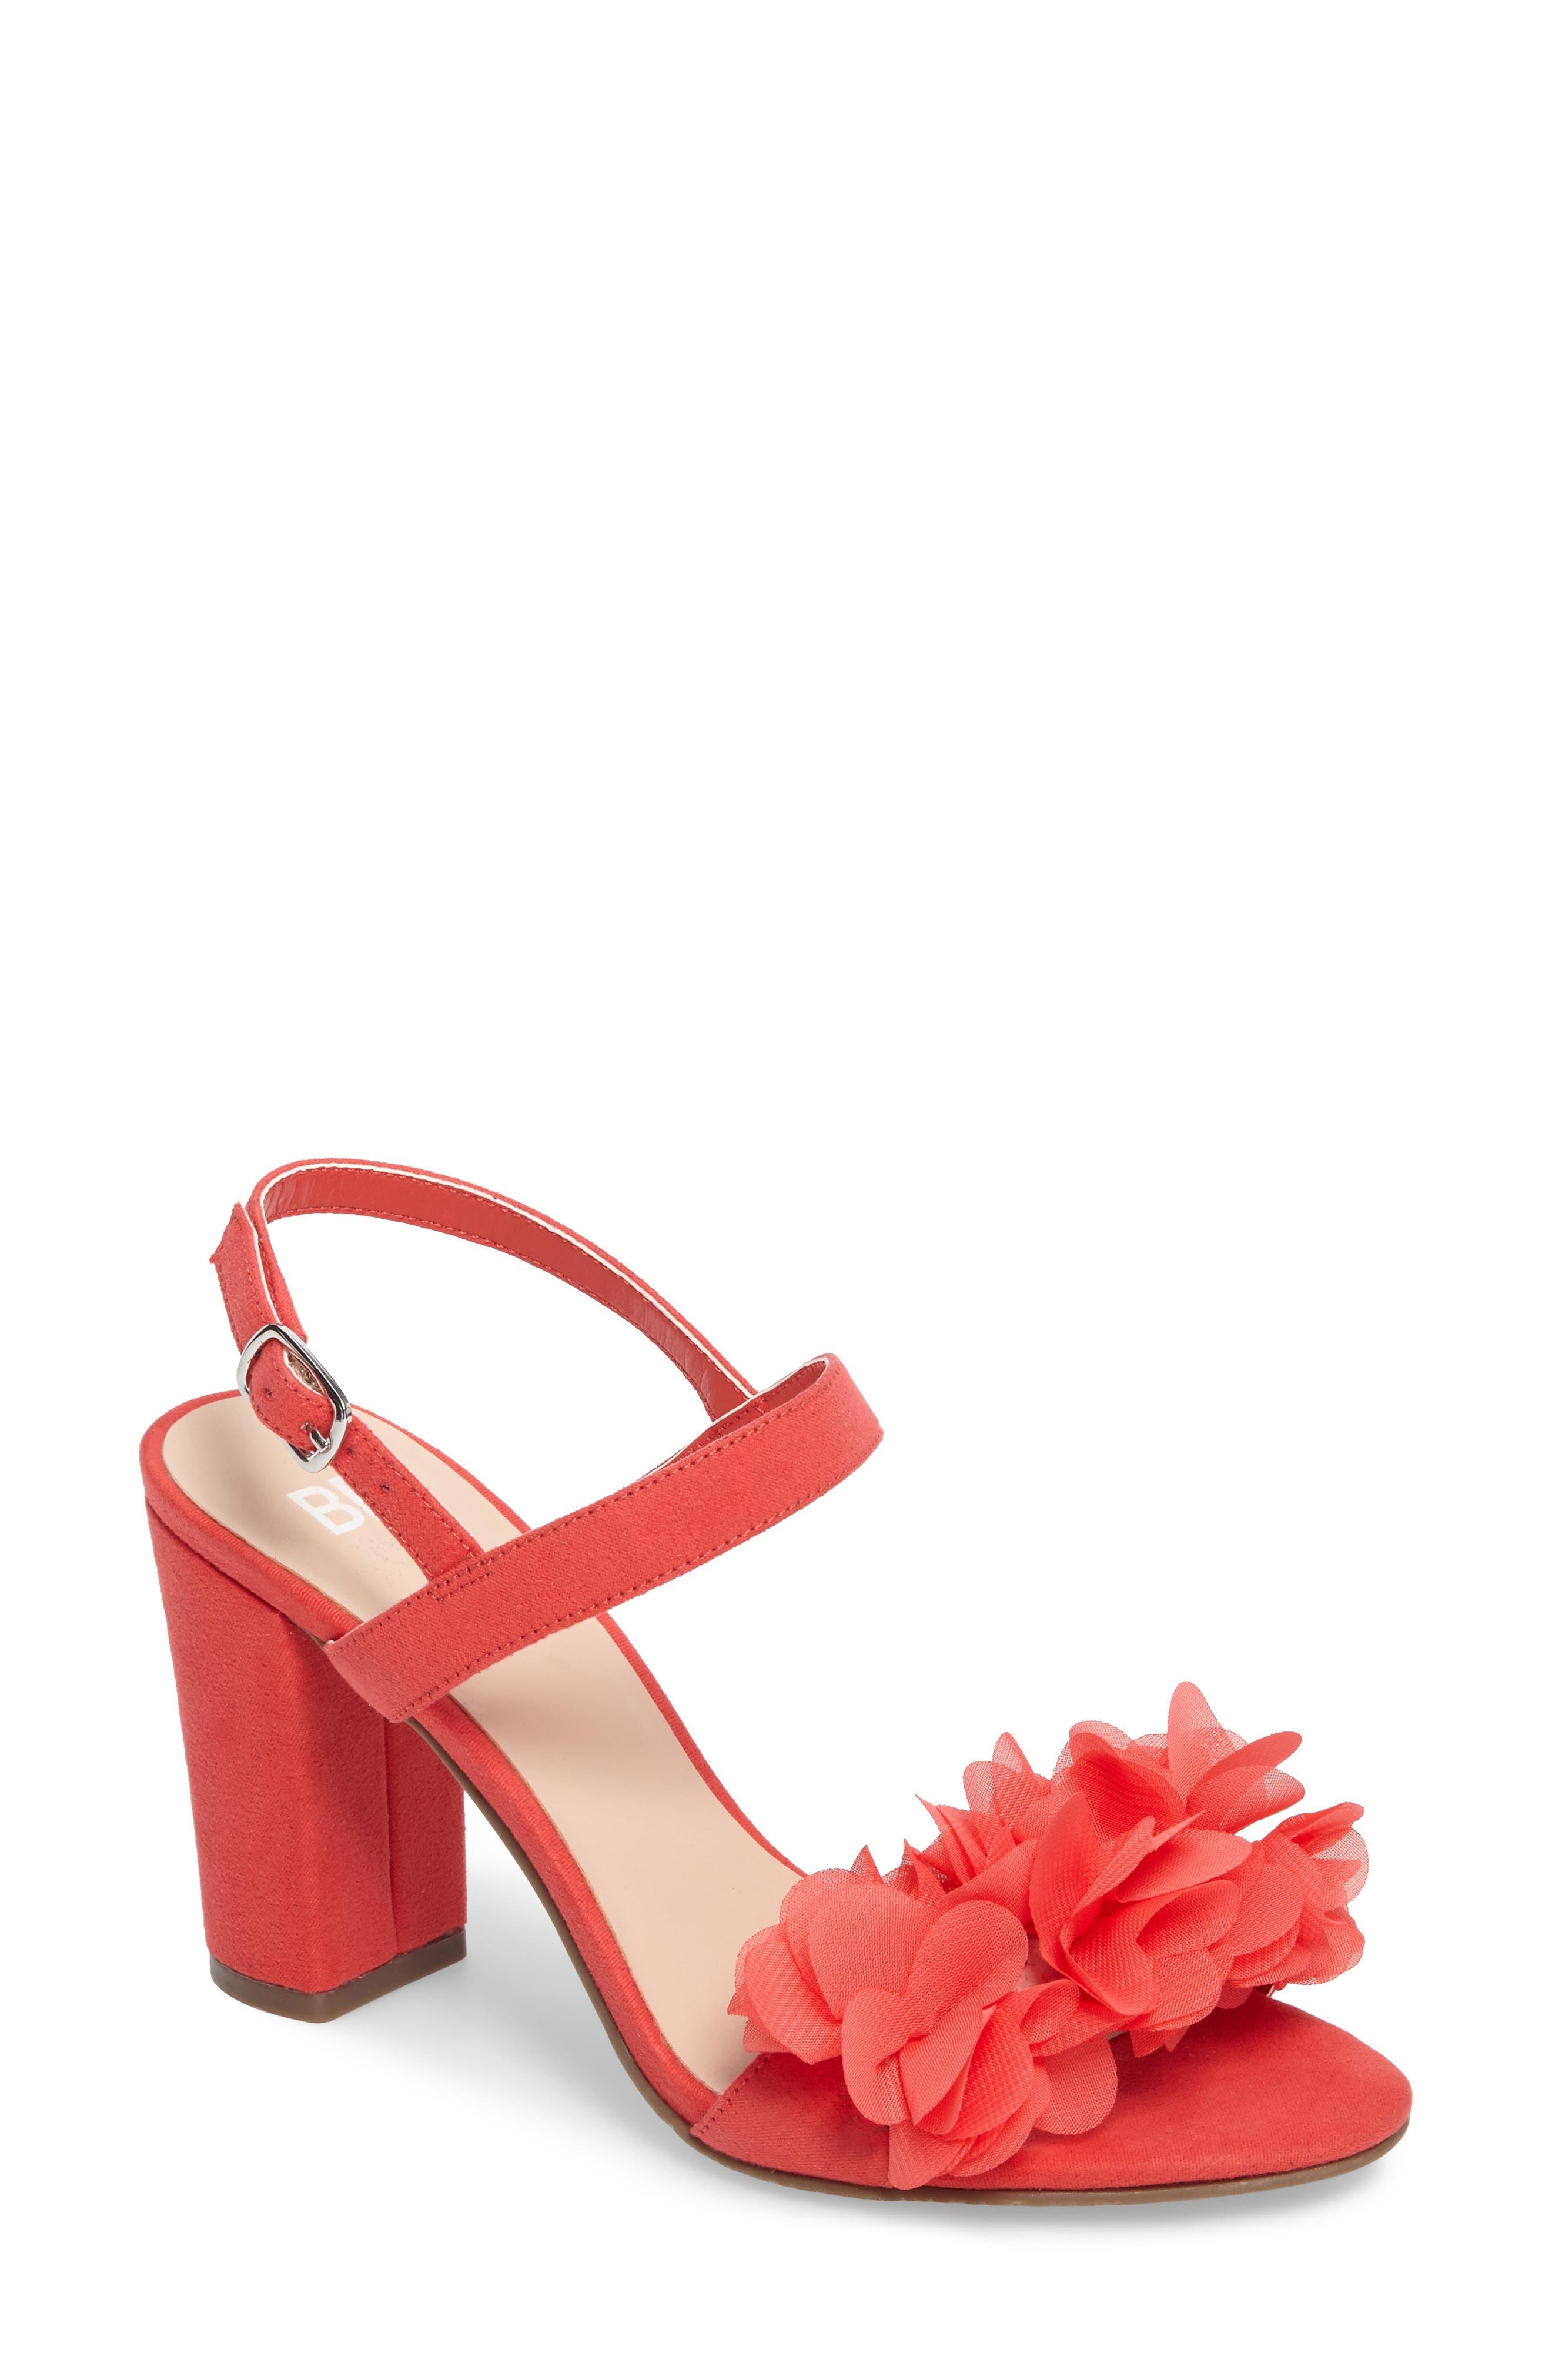 Lula Block Heel Slingback Sandal,                             Main thumbnail 1, color,                             Coral Flowers Faux Suede